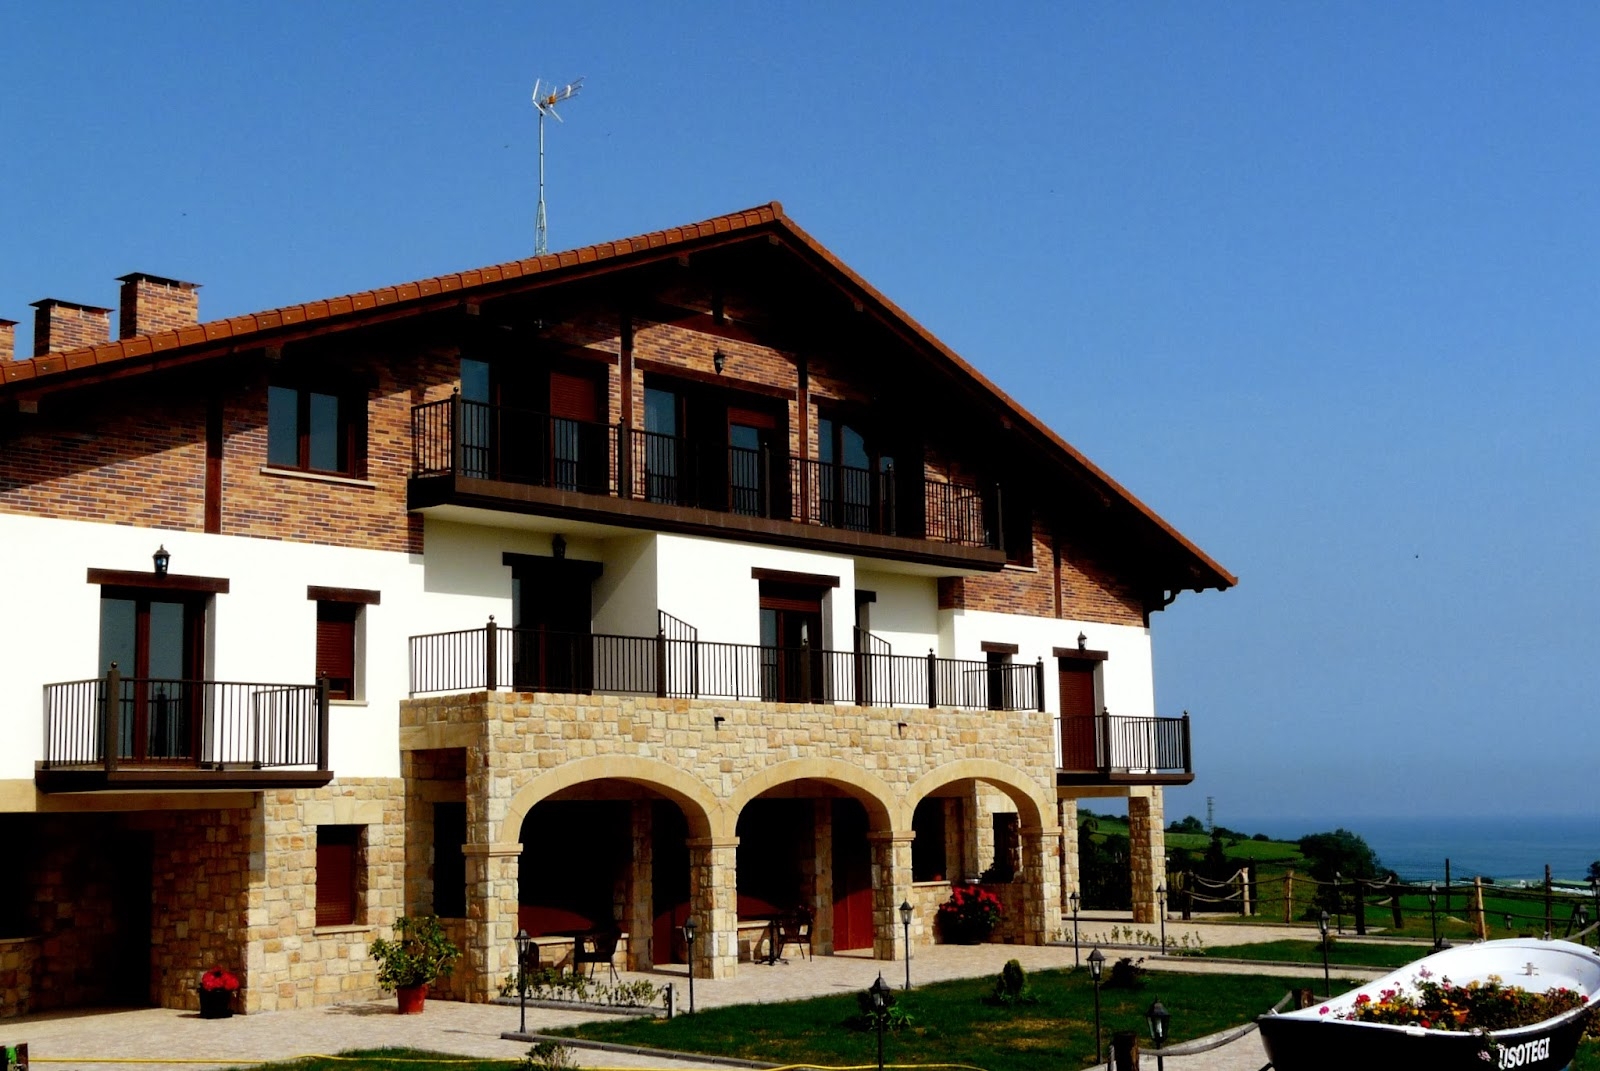 Usotegi agroturismo casa rural getaria guip zcoa pa s vasco - Casas pais vasco ...